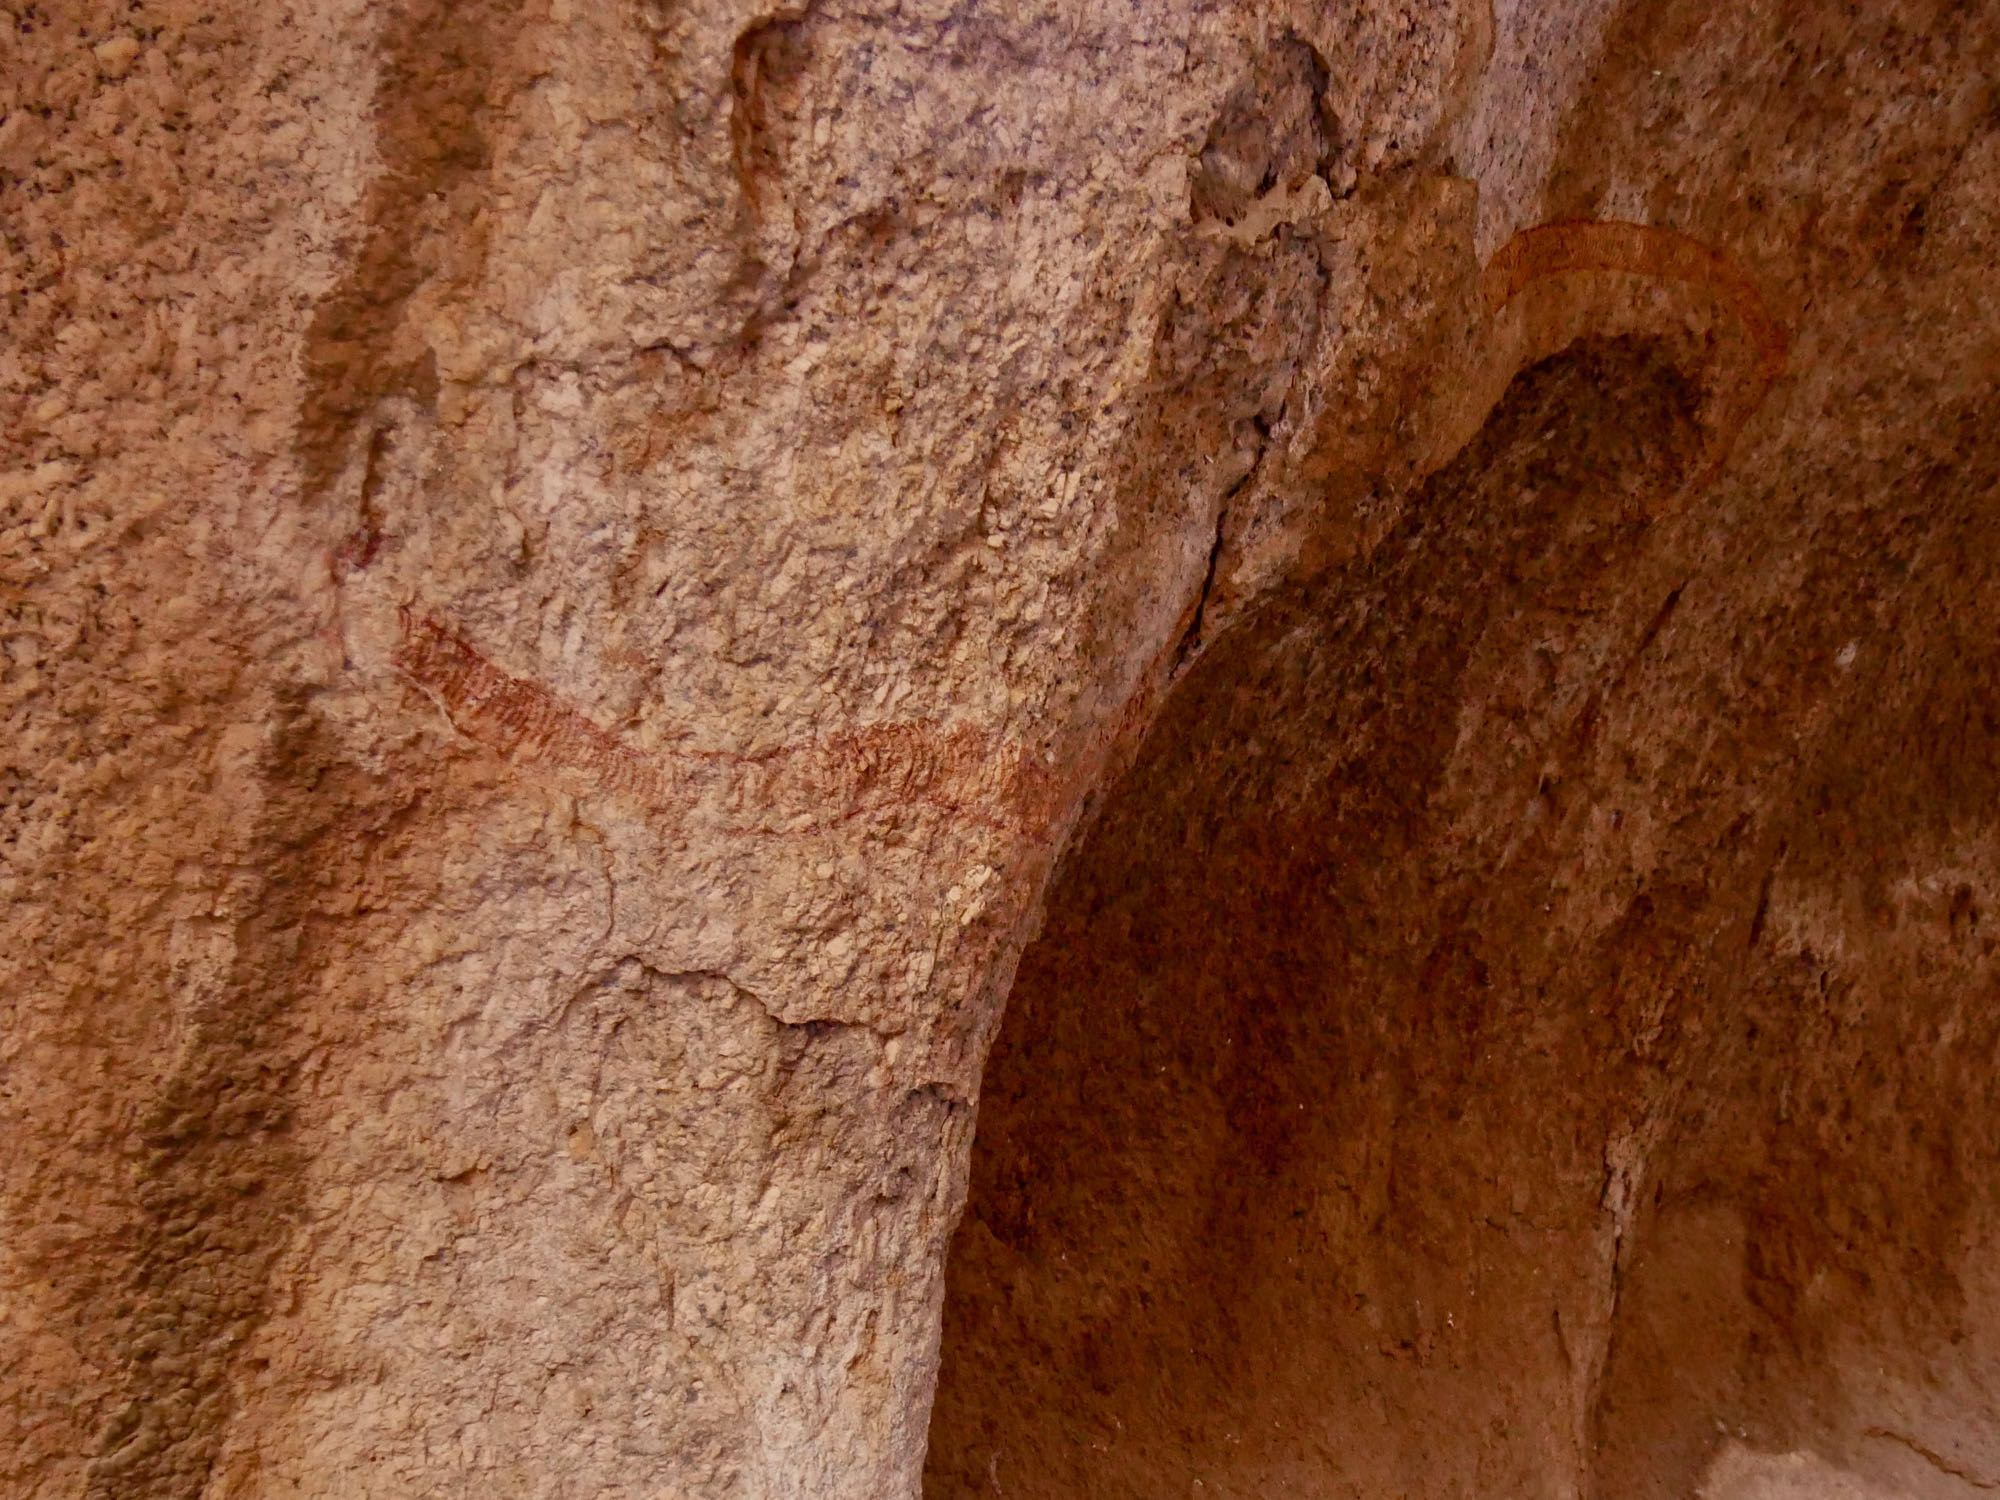 Peinture rupestre du Golden Snake au Spitzkoppe